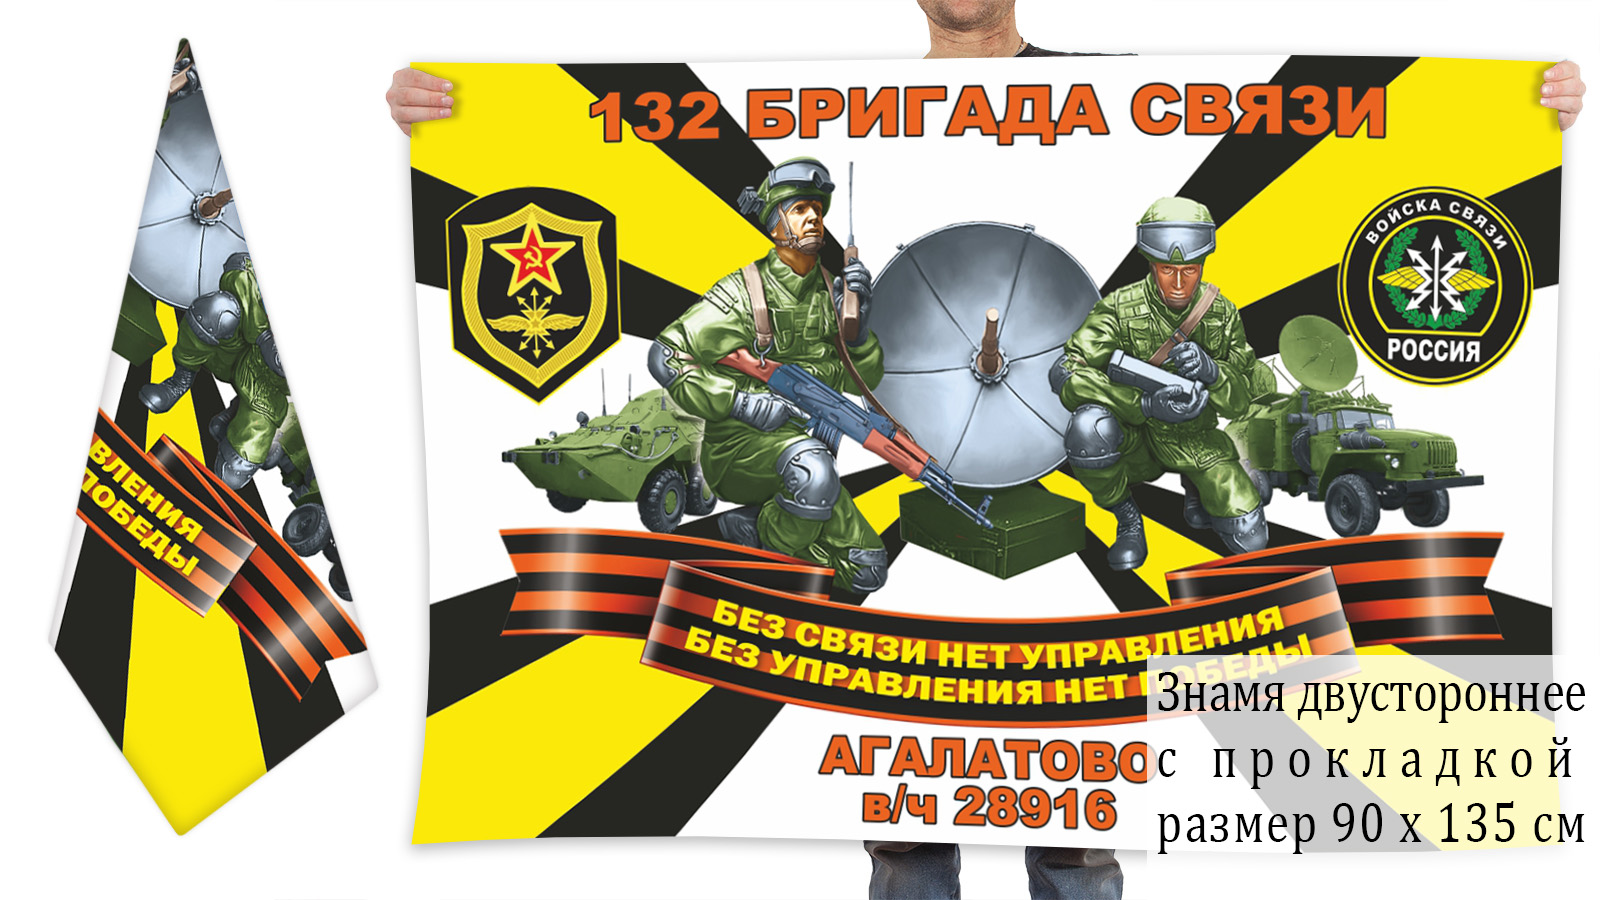 Двусторонний флаг 132 бригада связи